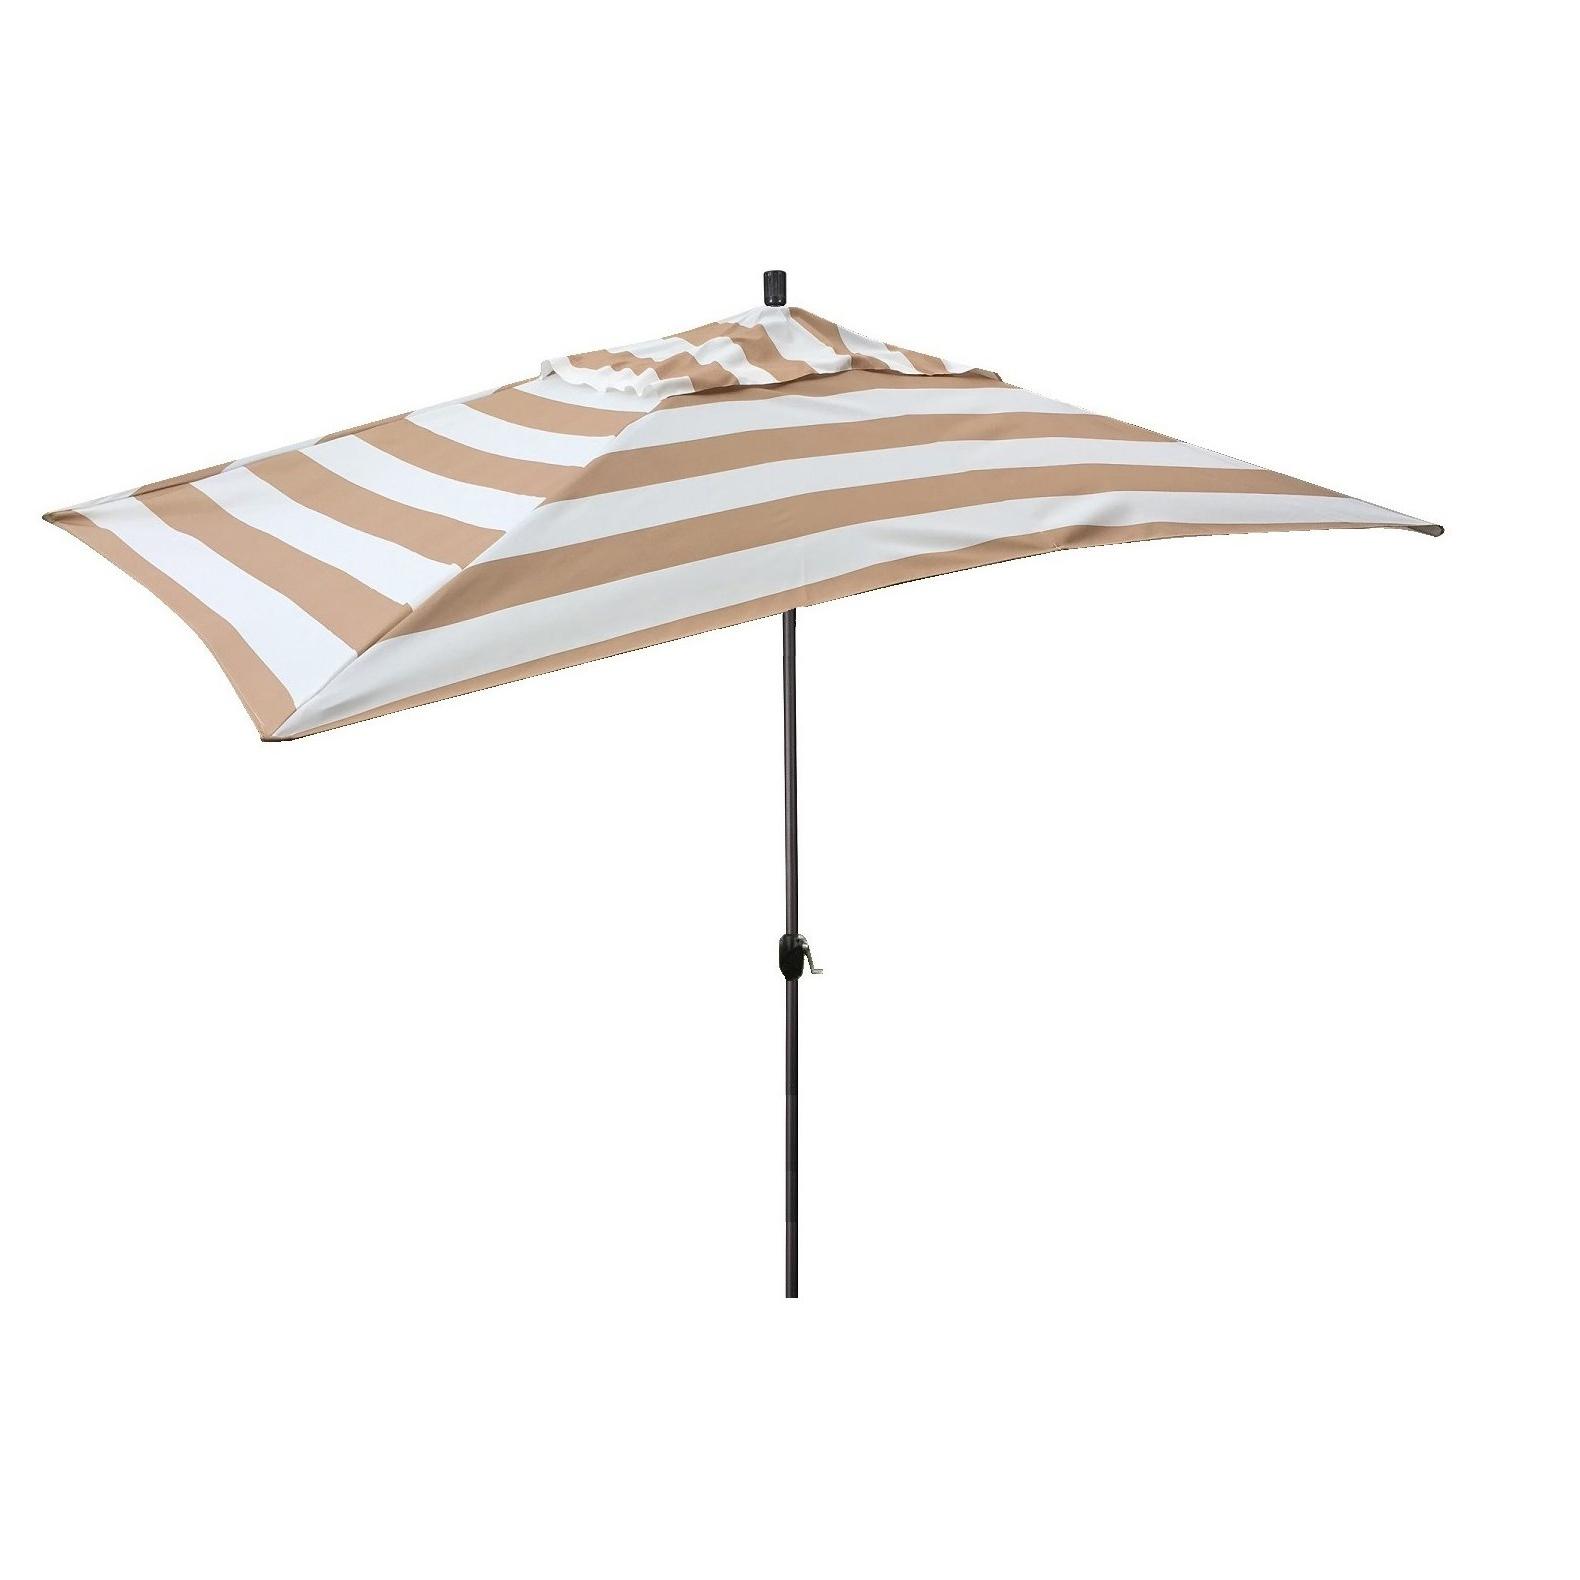 Norah Rectangular Market Umbrellas For 2020 Jalynn 10' X 6' Rectangular Market Umbrella (View 10 of 20)